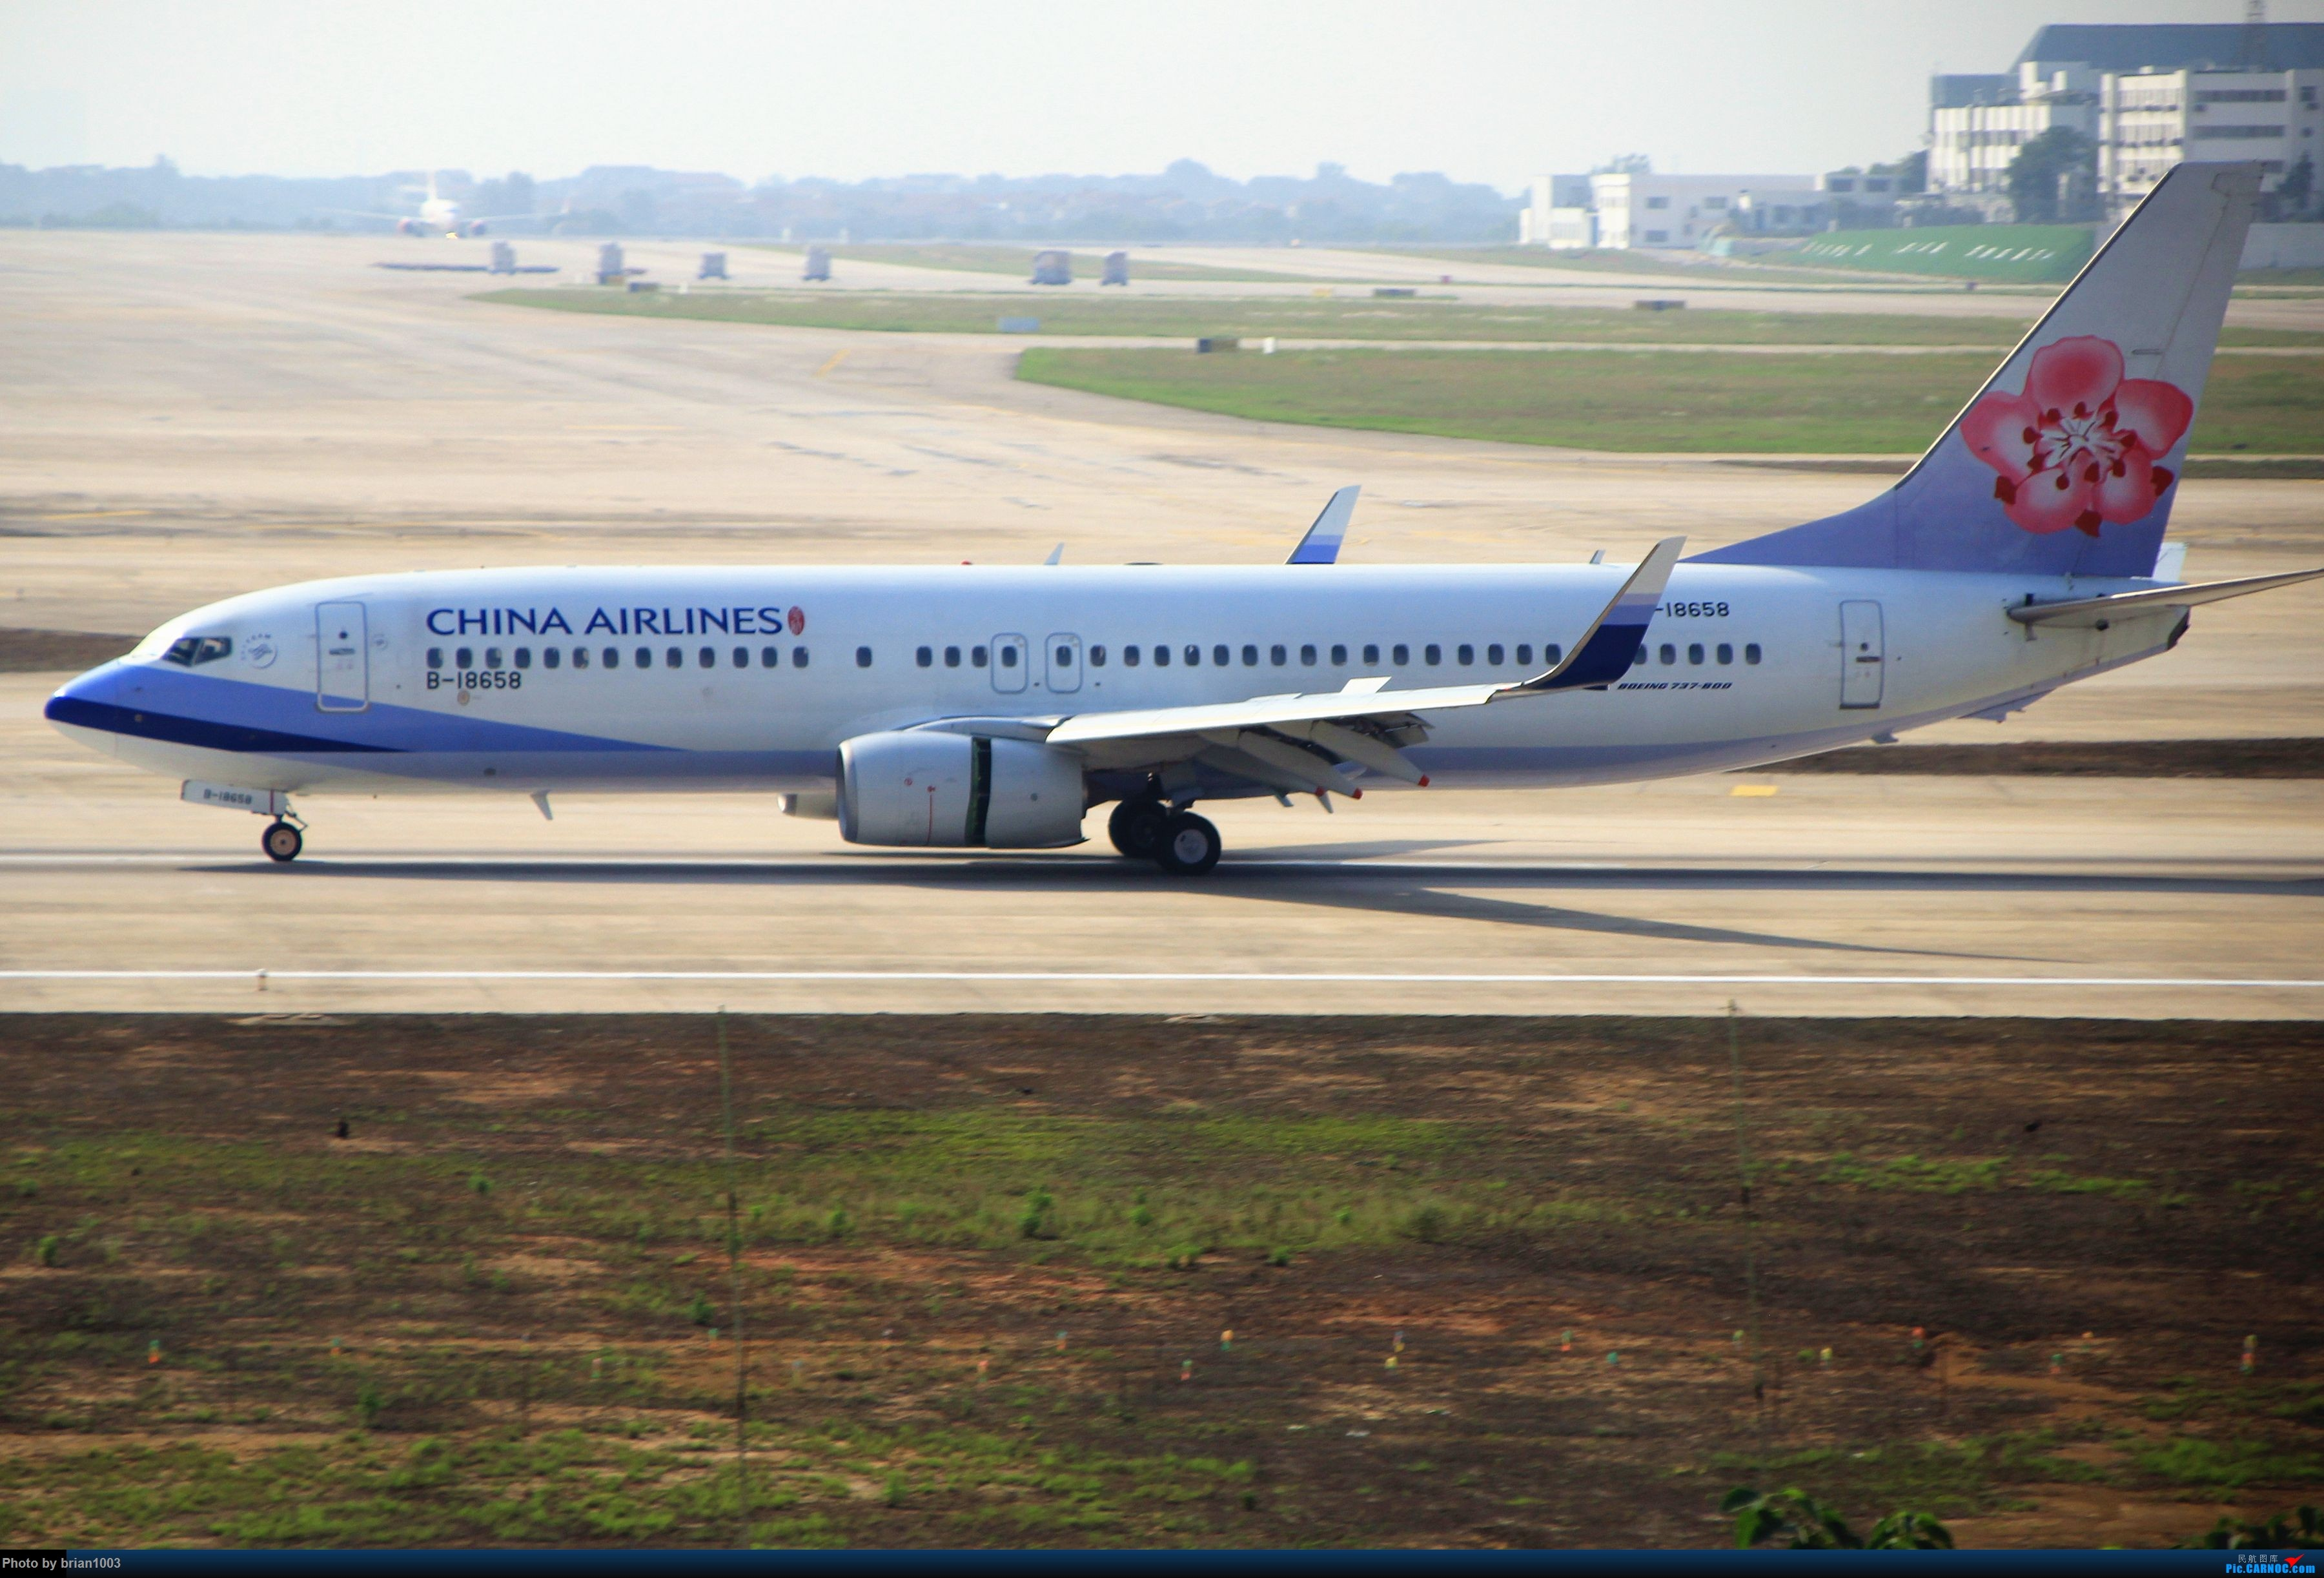 Re:[原创]WUH武汉天河机场拍机之喜迎酷航788和偶遇某其他飞机 BOEING 737-800 B-18658